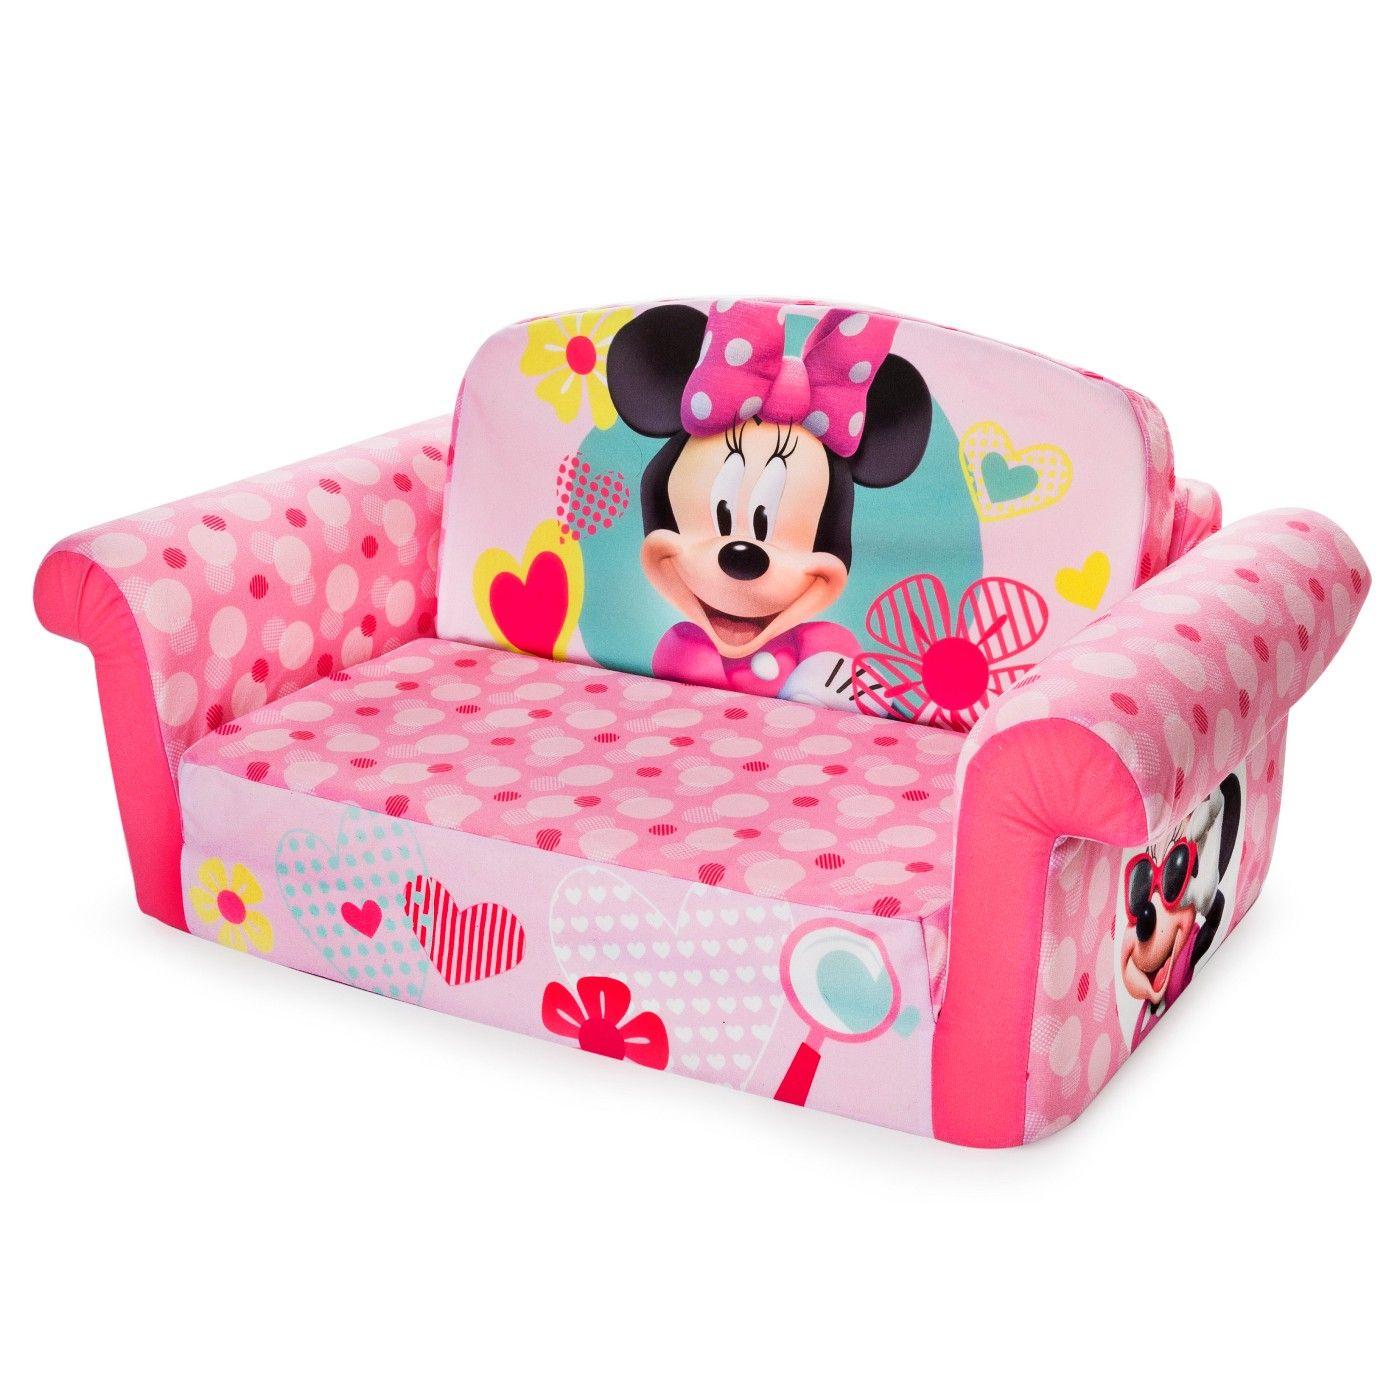 Marshmallow Furniture Childrens 2 In 1 Flip Open Foam Sofa Minnie